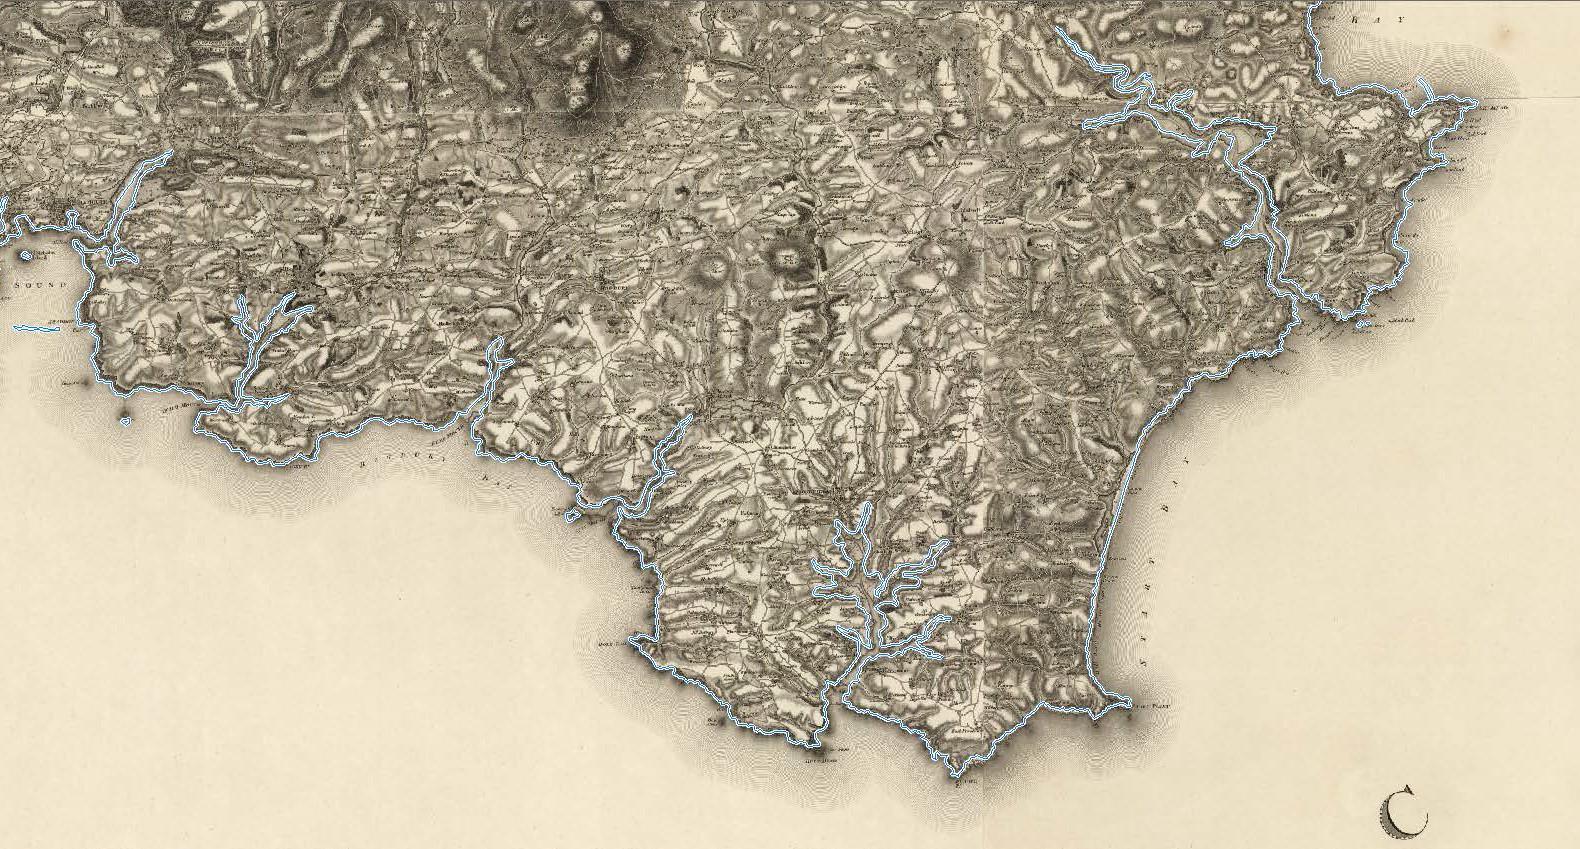 Detail from W. Mudge County of Devon (1809) with modern coastline